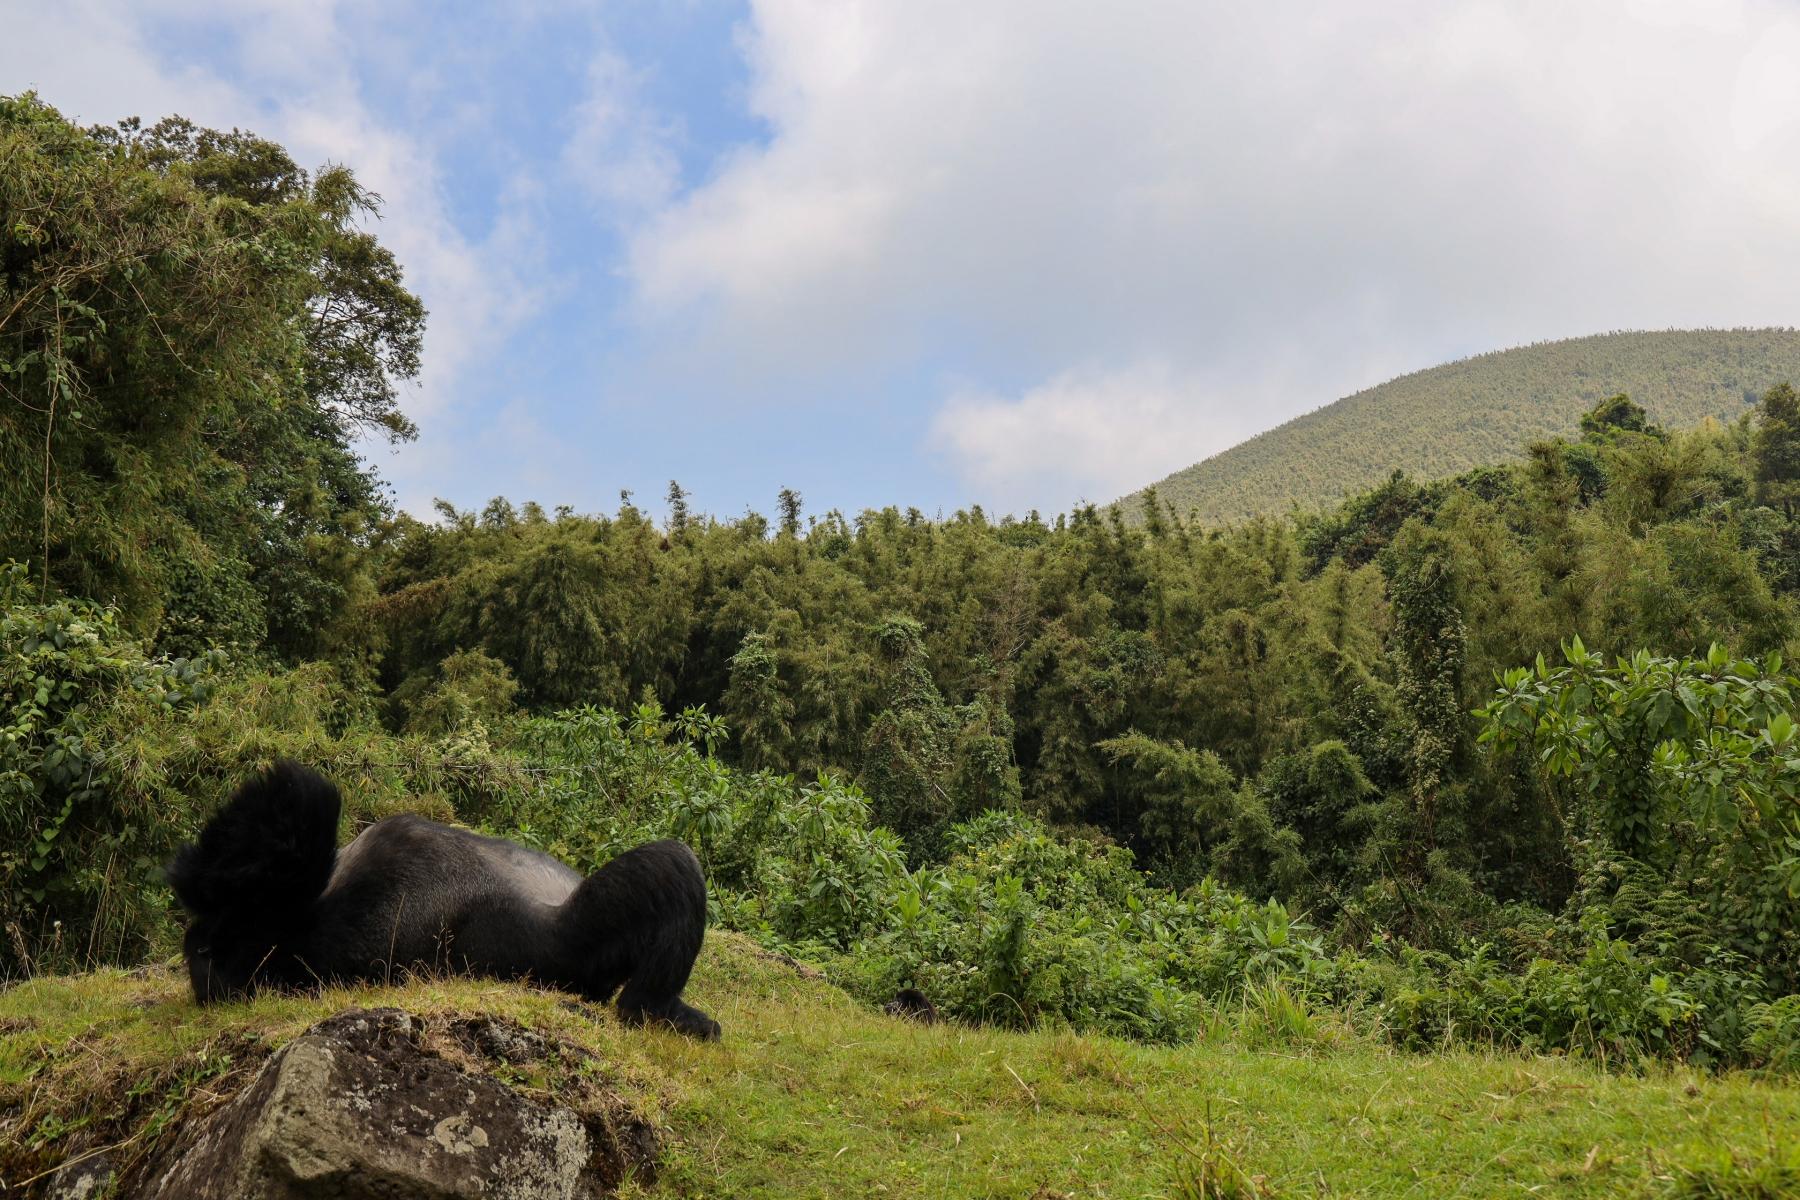 Rwanda-Gorilla-Trekking-Photo-Credit-Kate-Webster-017